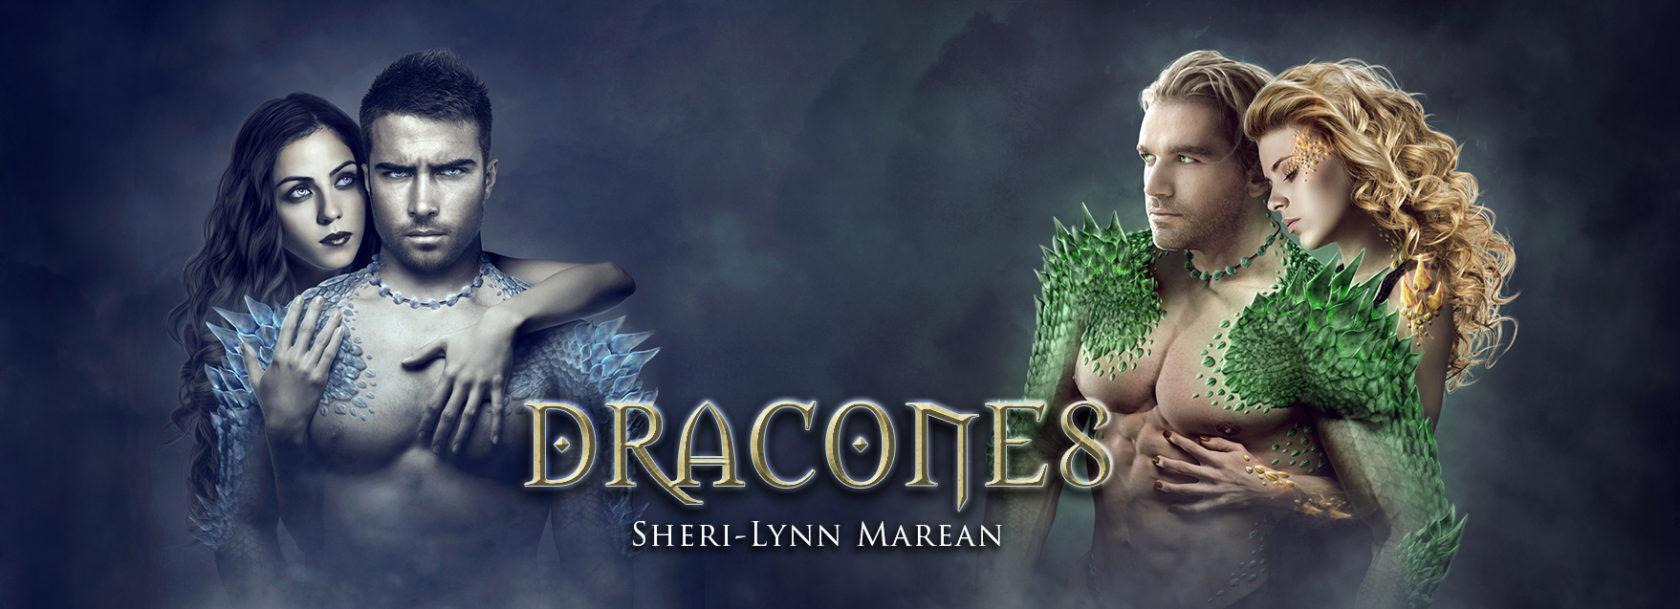 Dracones Sheri Lynn Marean